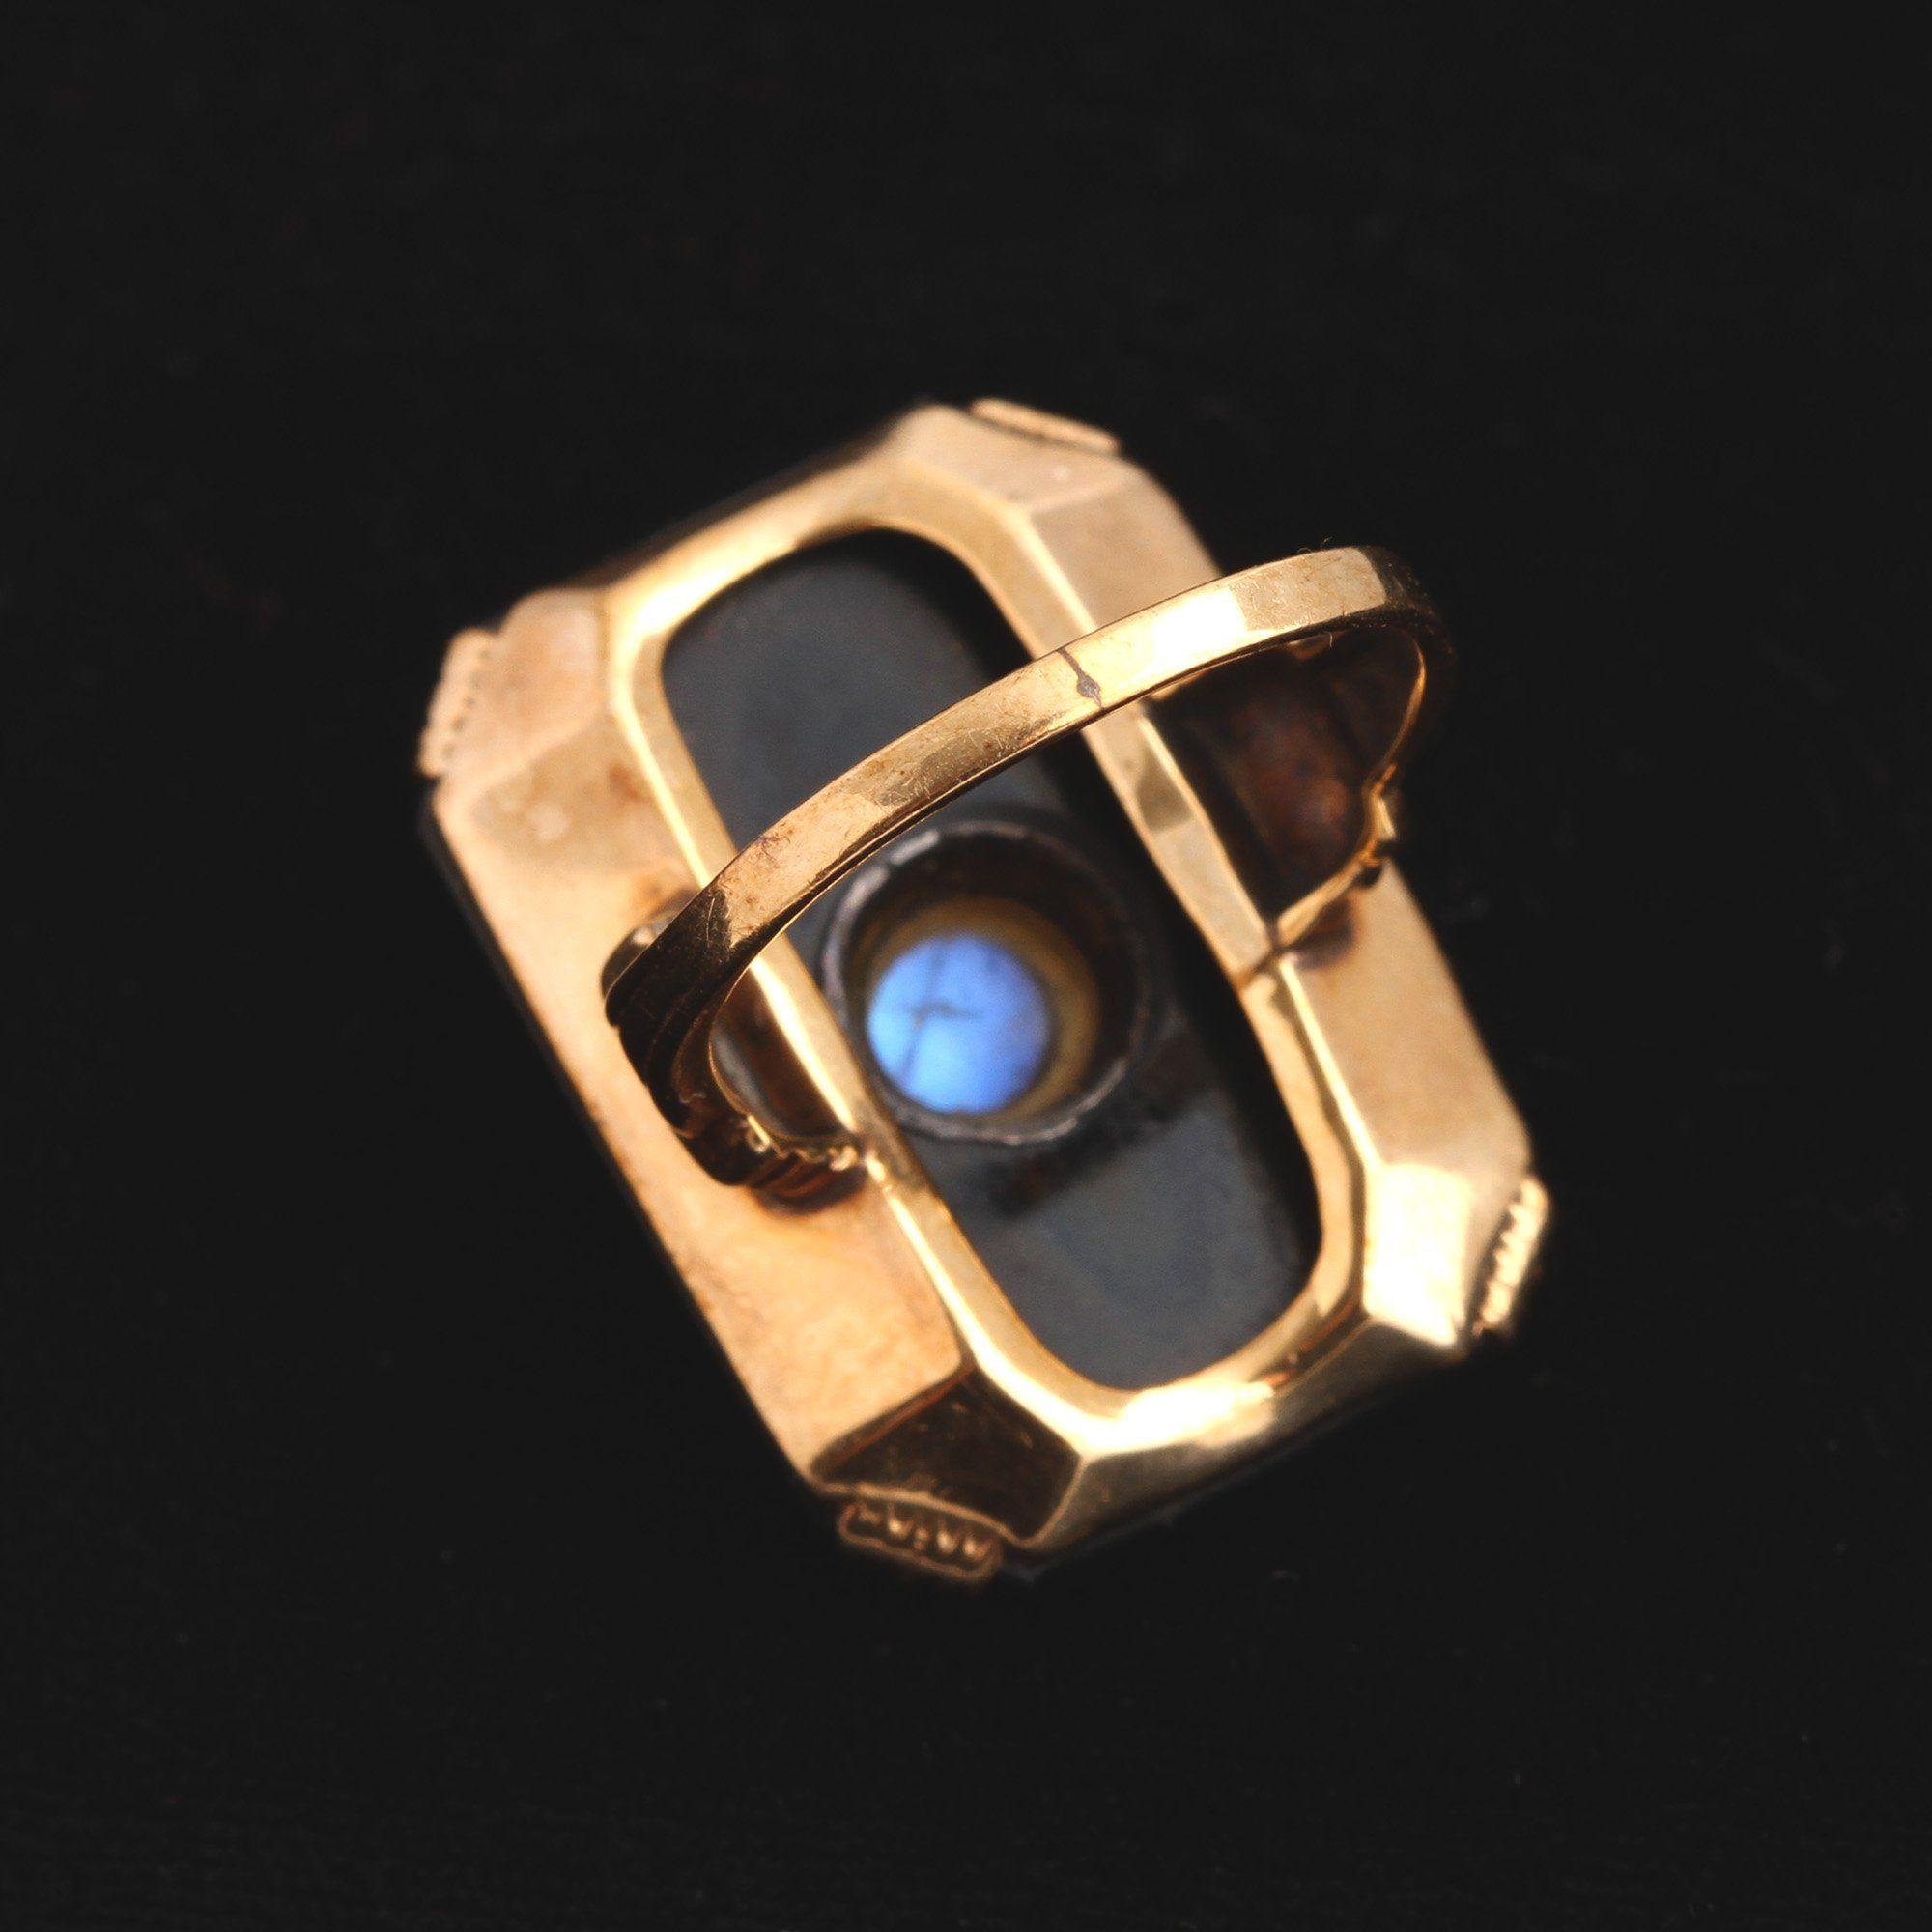 Art Deco Onyx & Moonstone Cocktail Ring